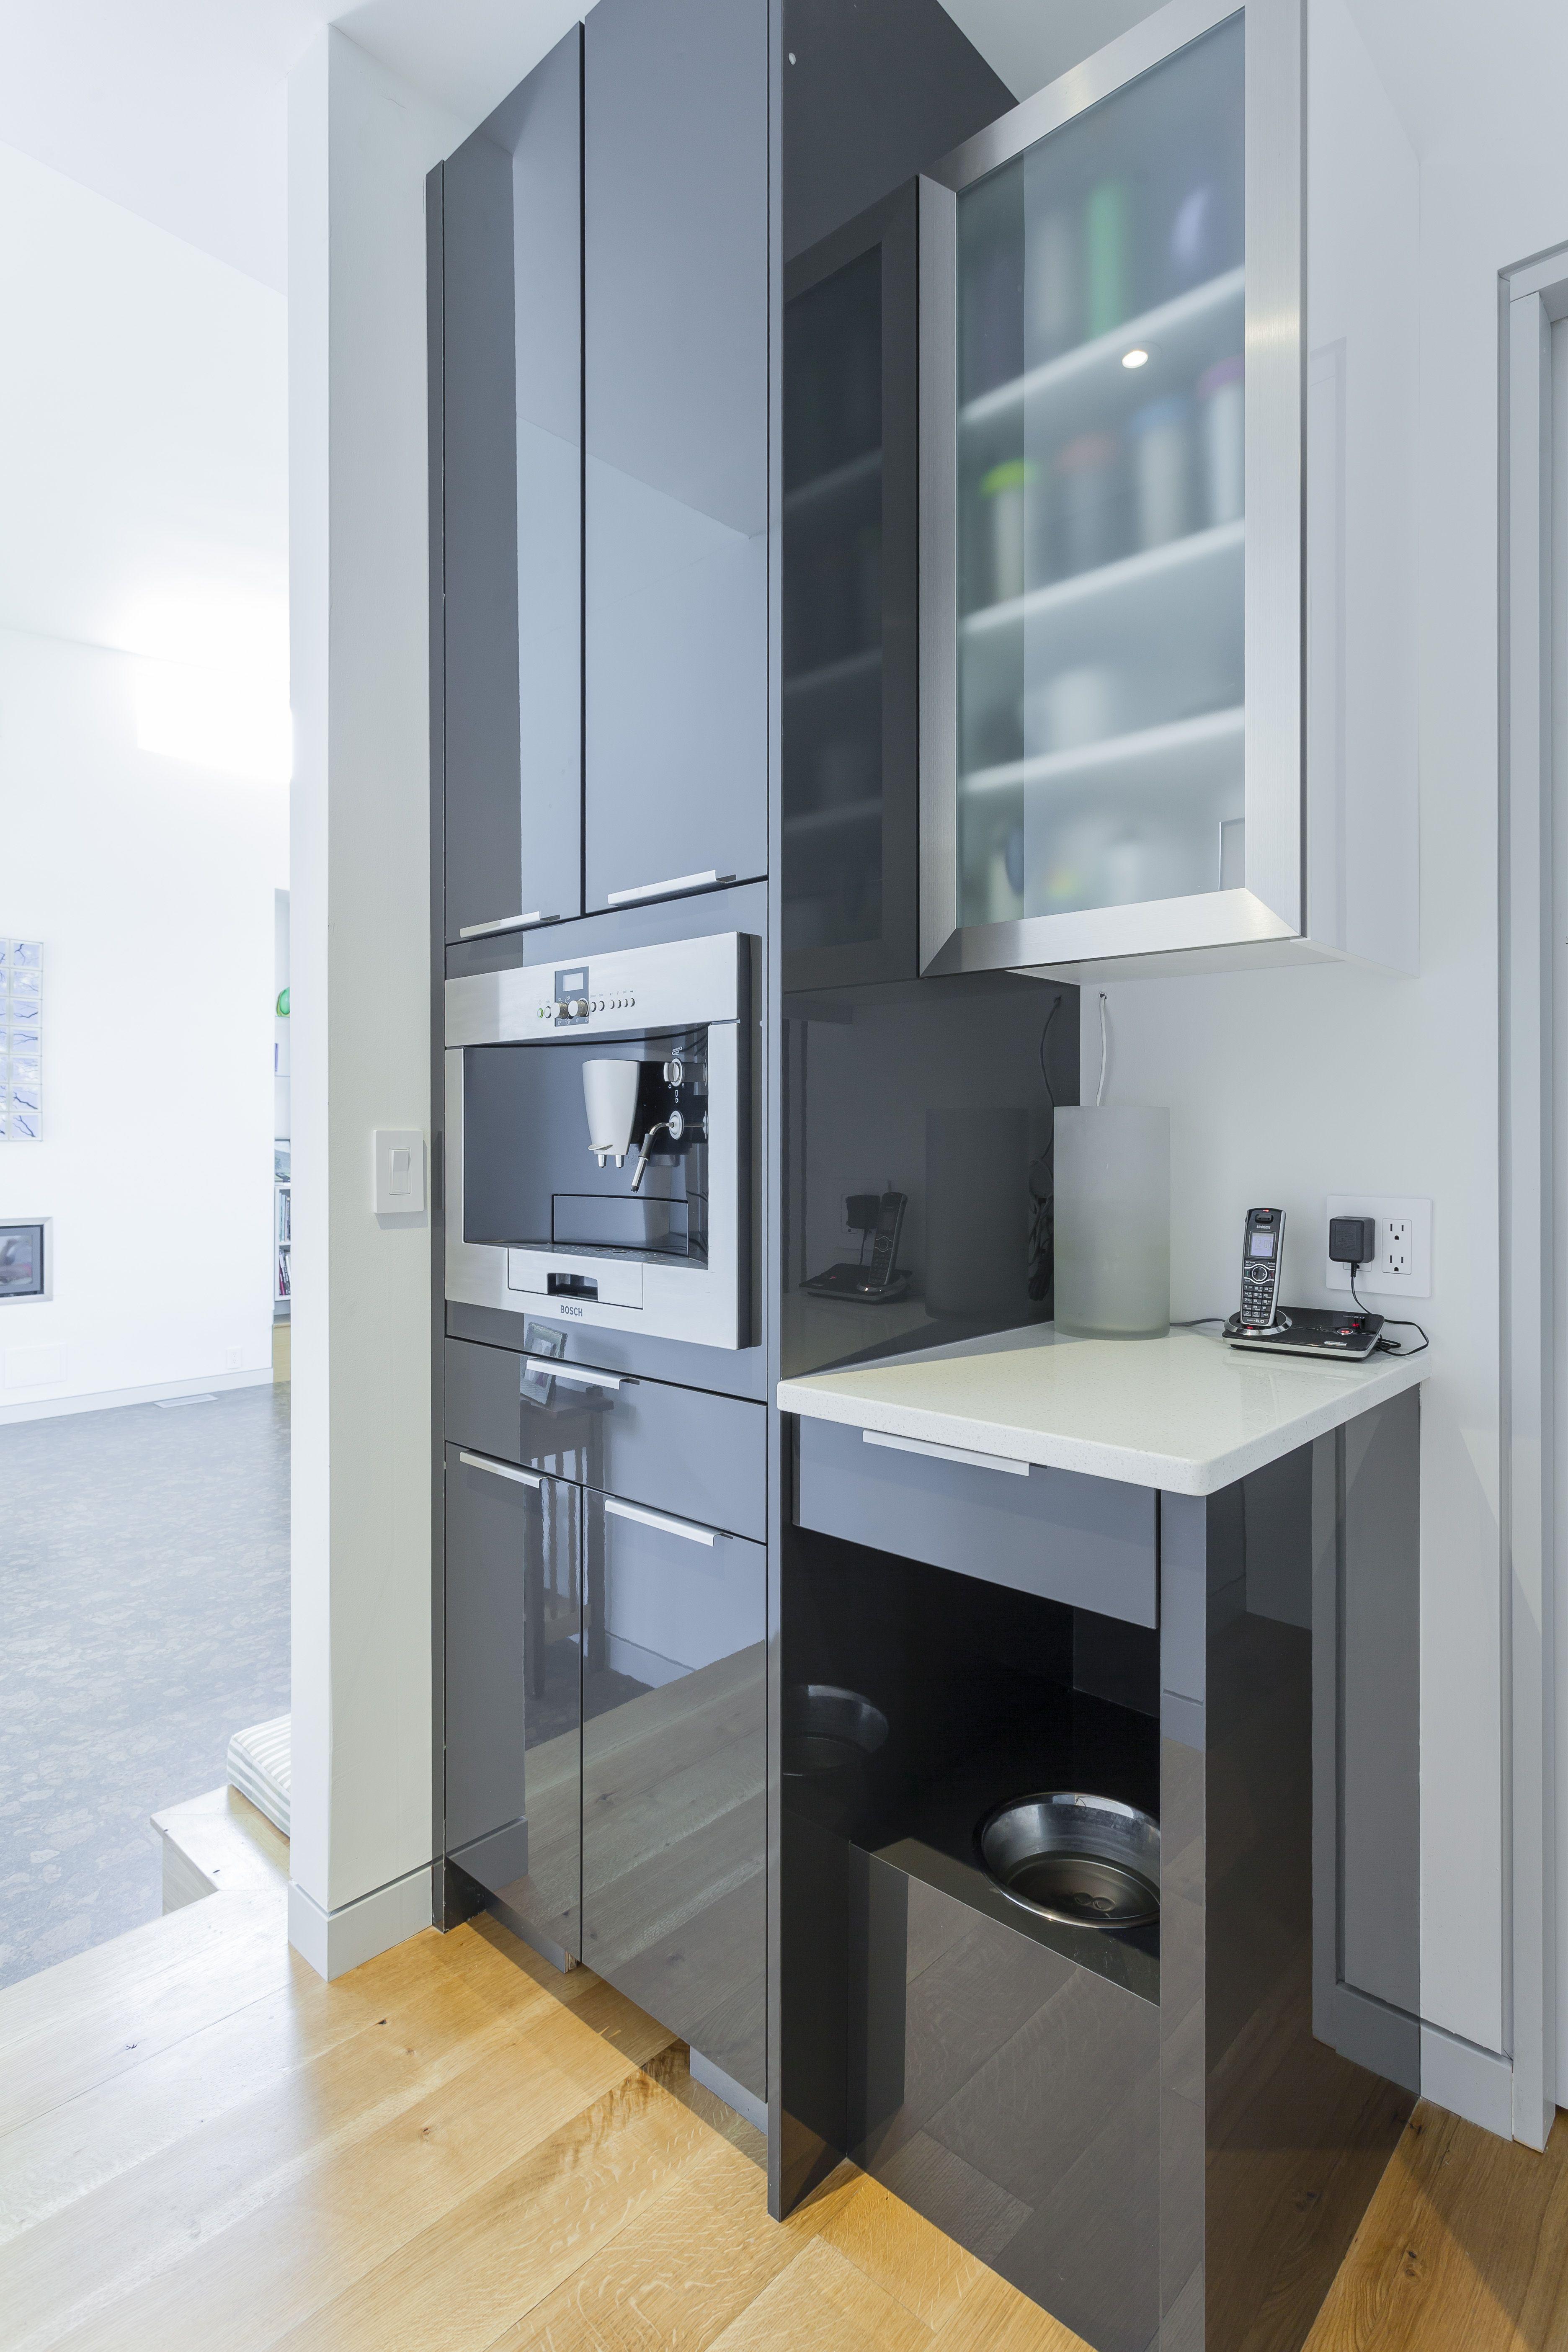 Elmwood Cabinetry, Bosch Appliances, back kitchen, large ...